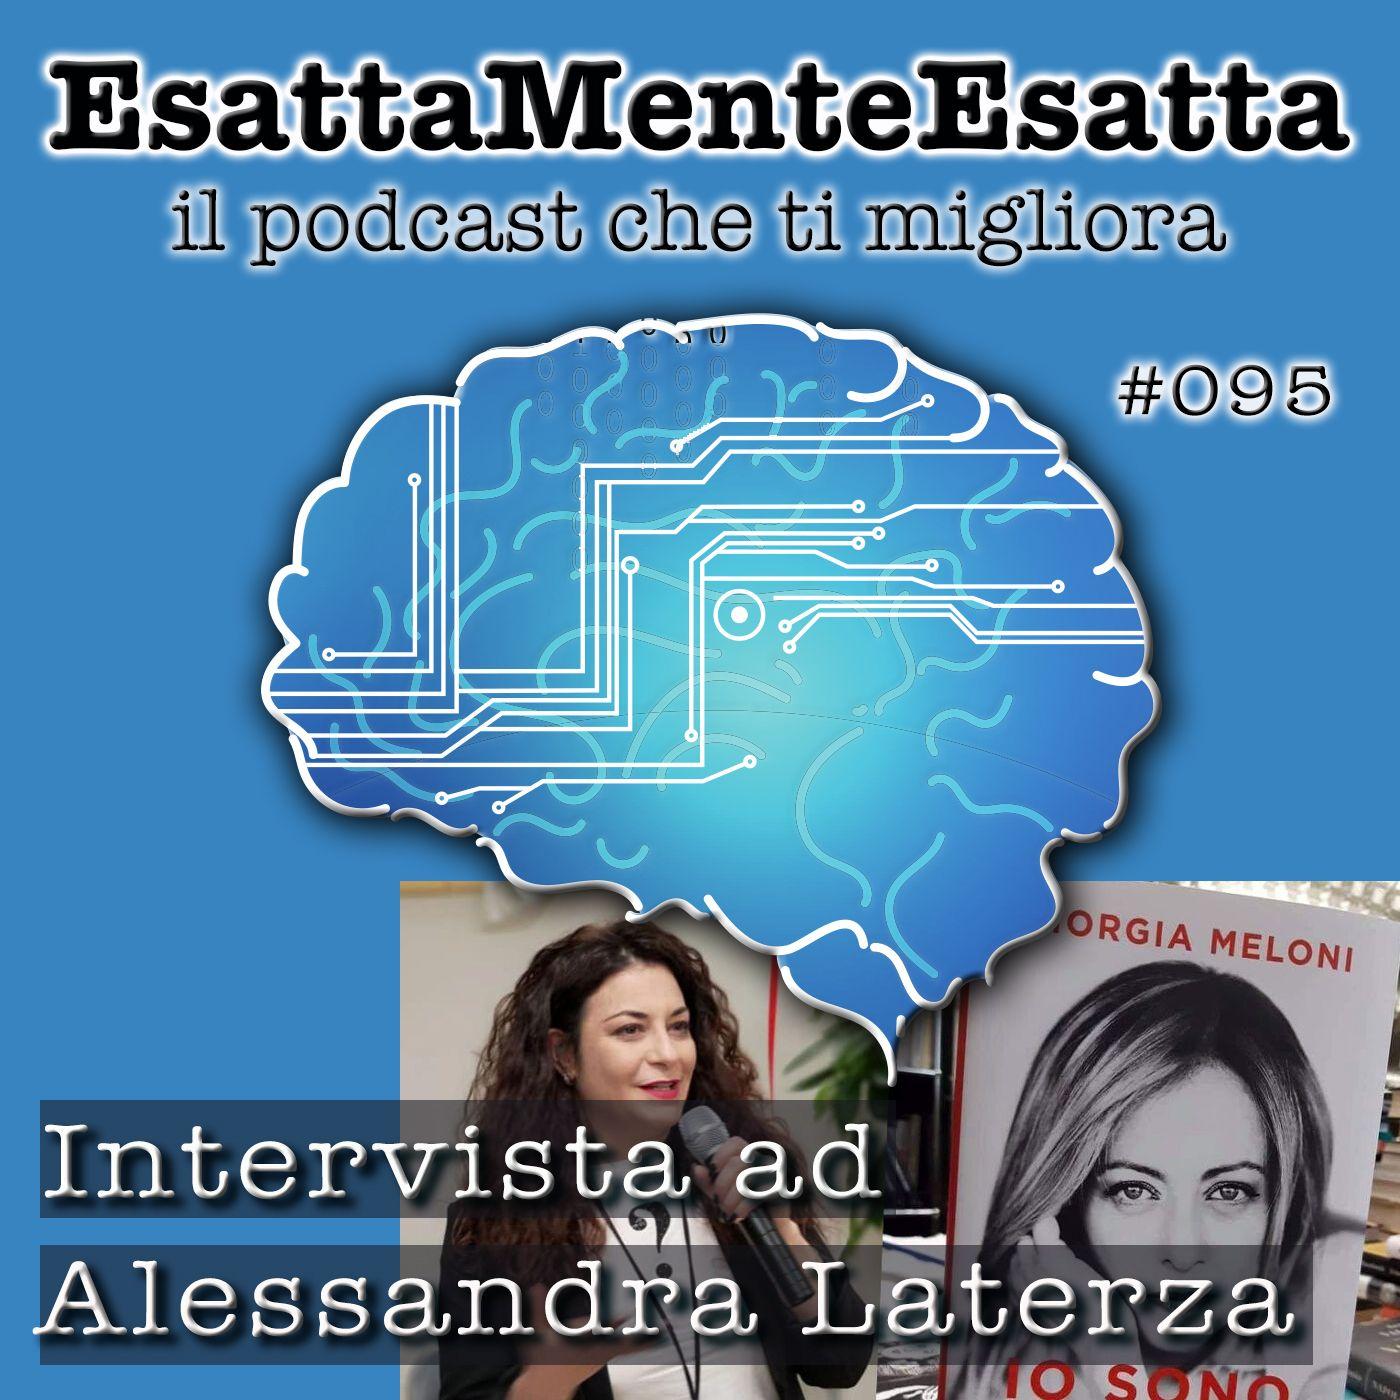 Intervista ad Alessandra Laterza #095